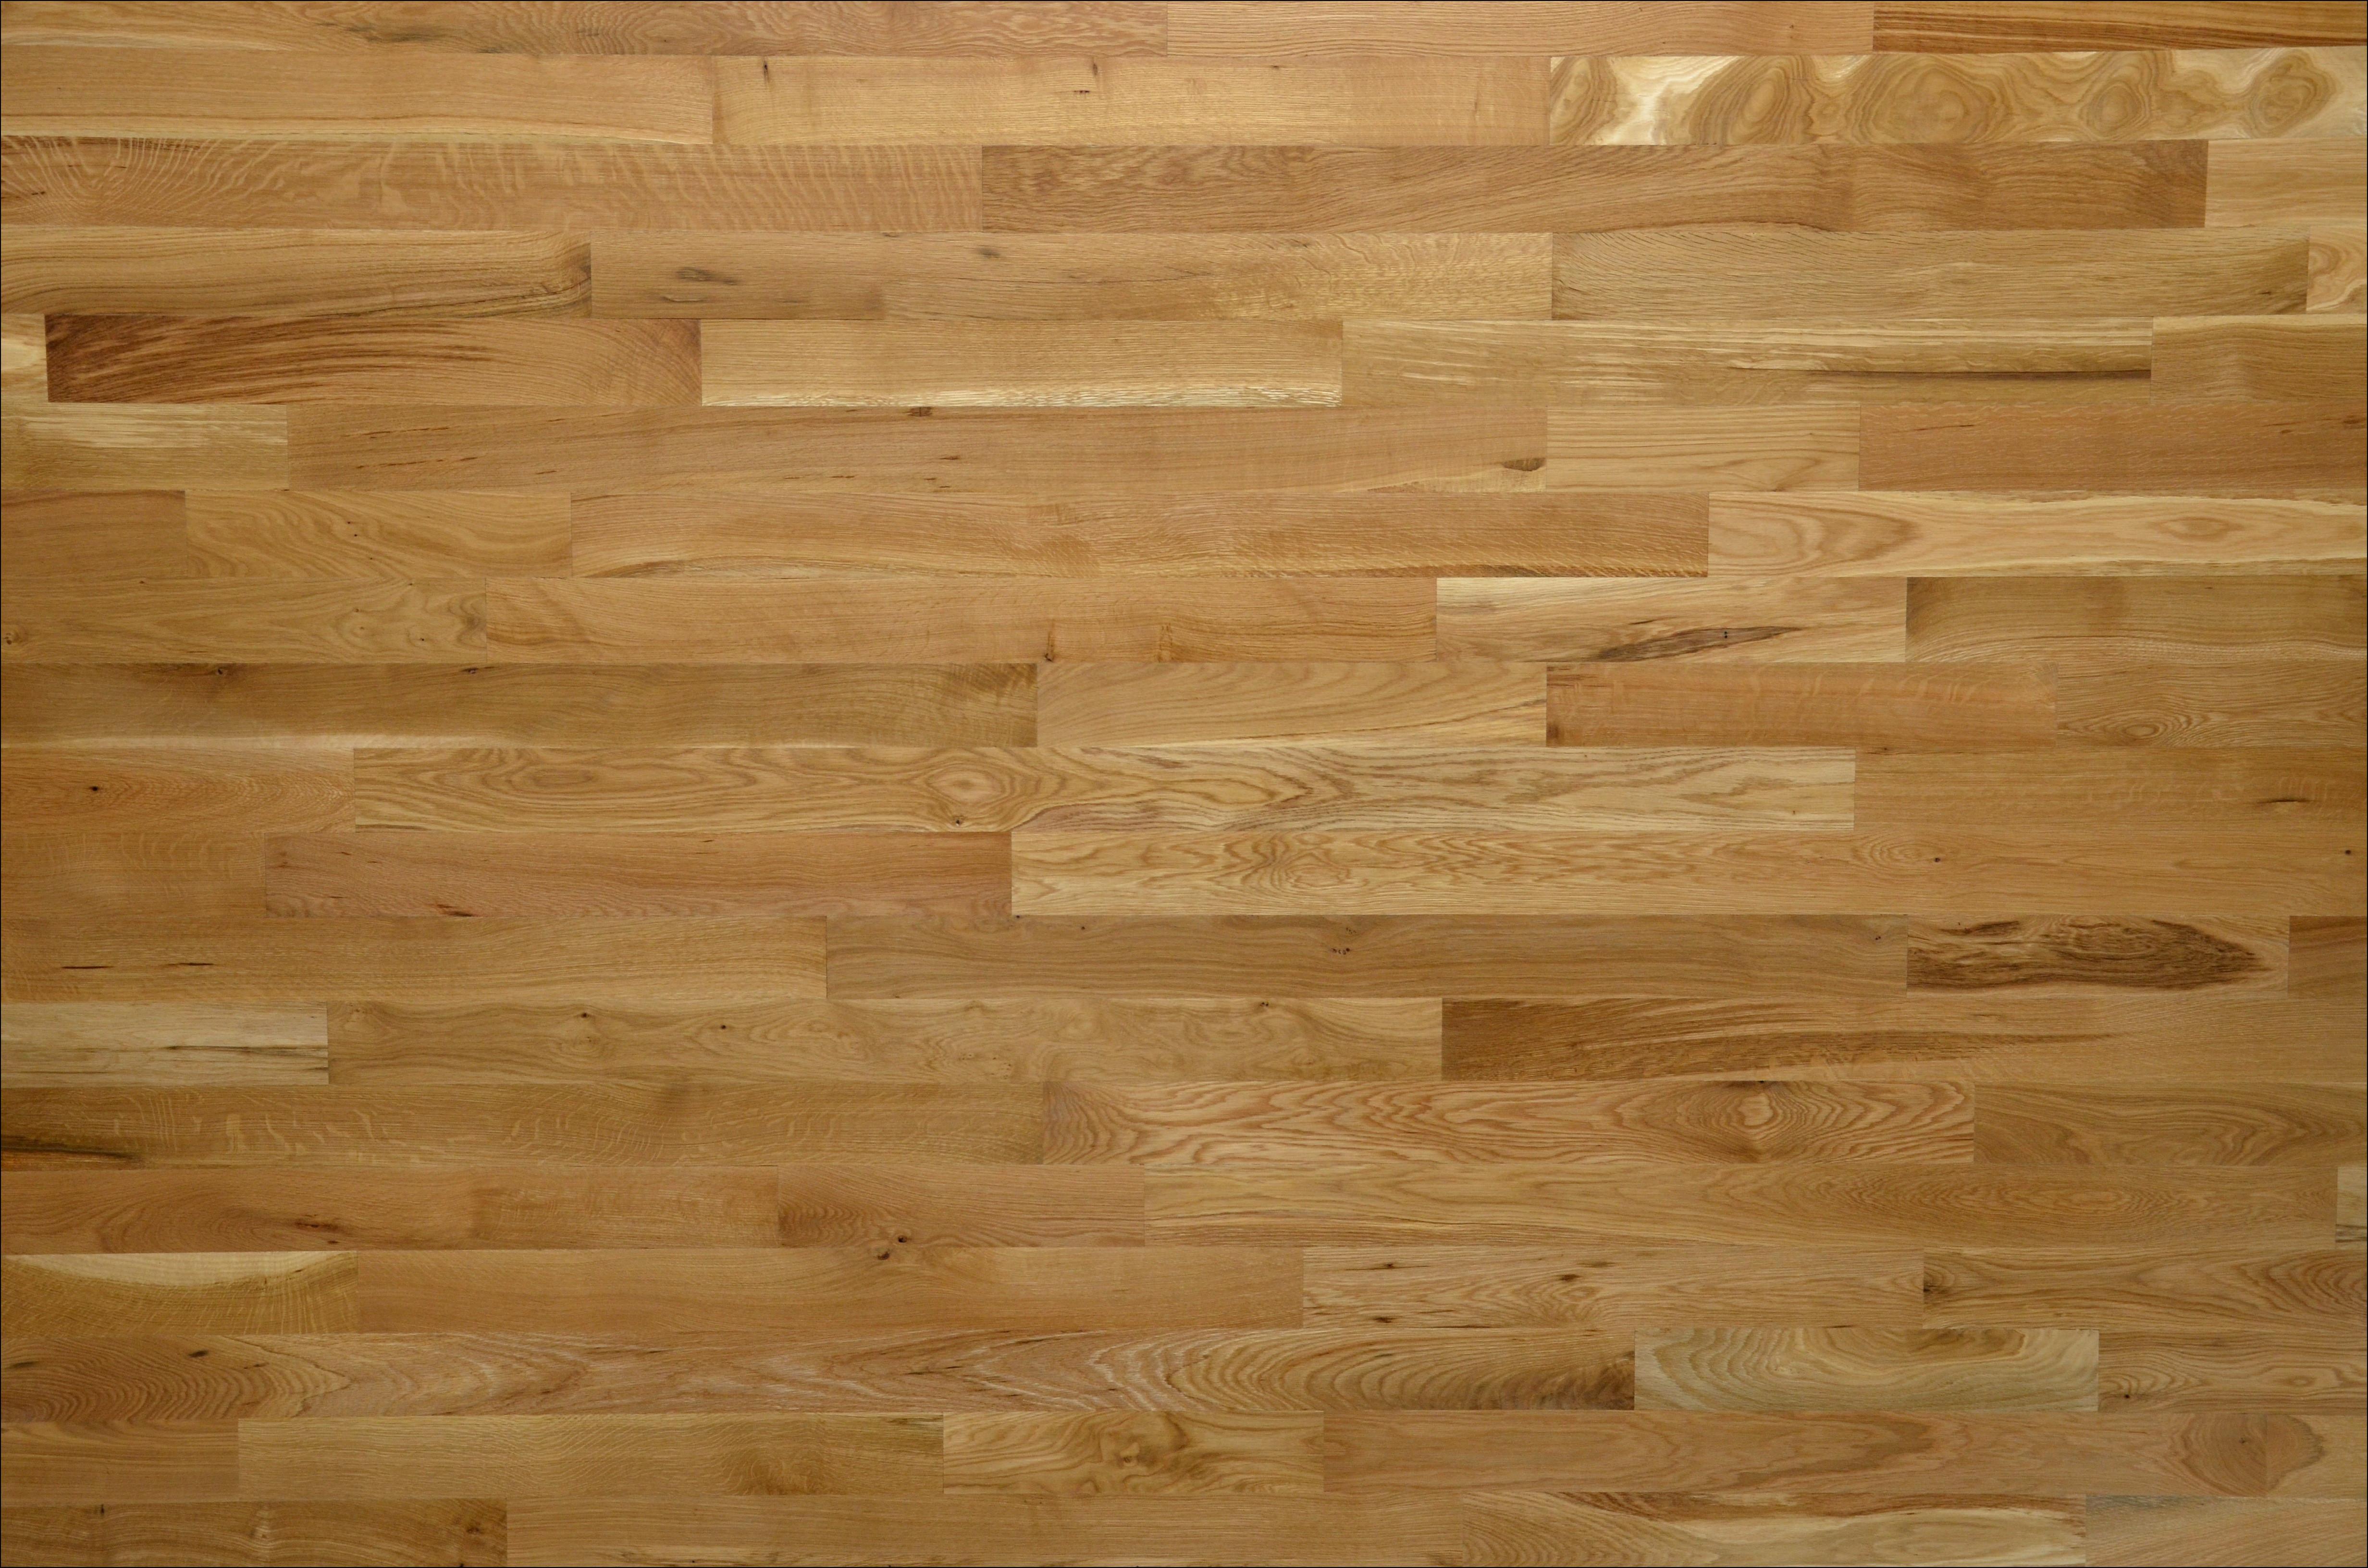 red oak engineered hardwood flooring of 2 white oak flooring unfinished stock 2 mon red oak lacrosse within 2 white oak flooring unfinished stock 2 mon red oak lacrosse flooring